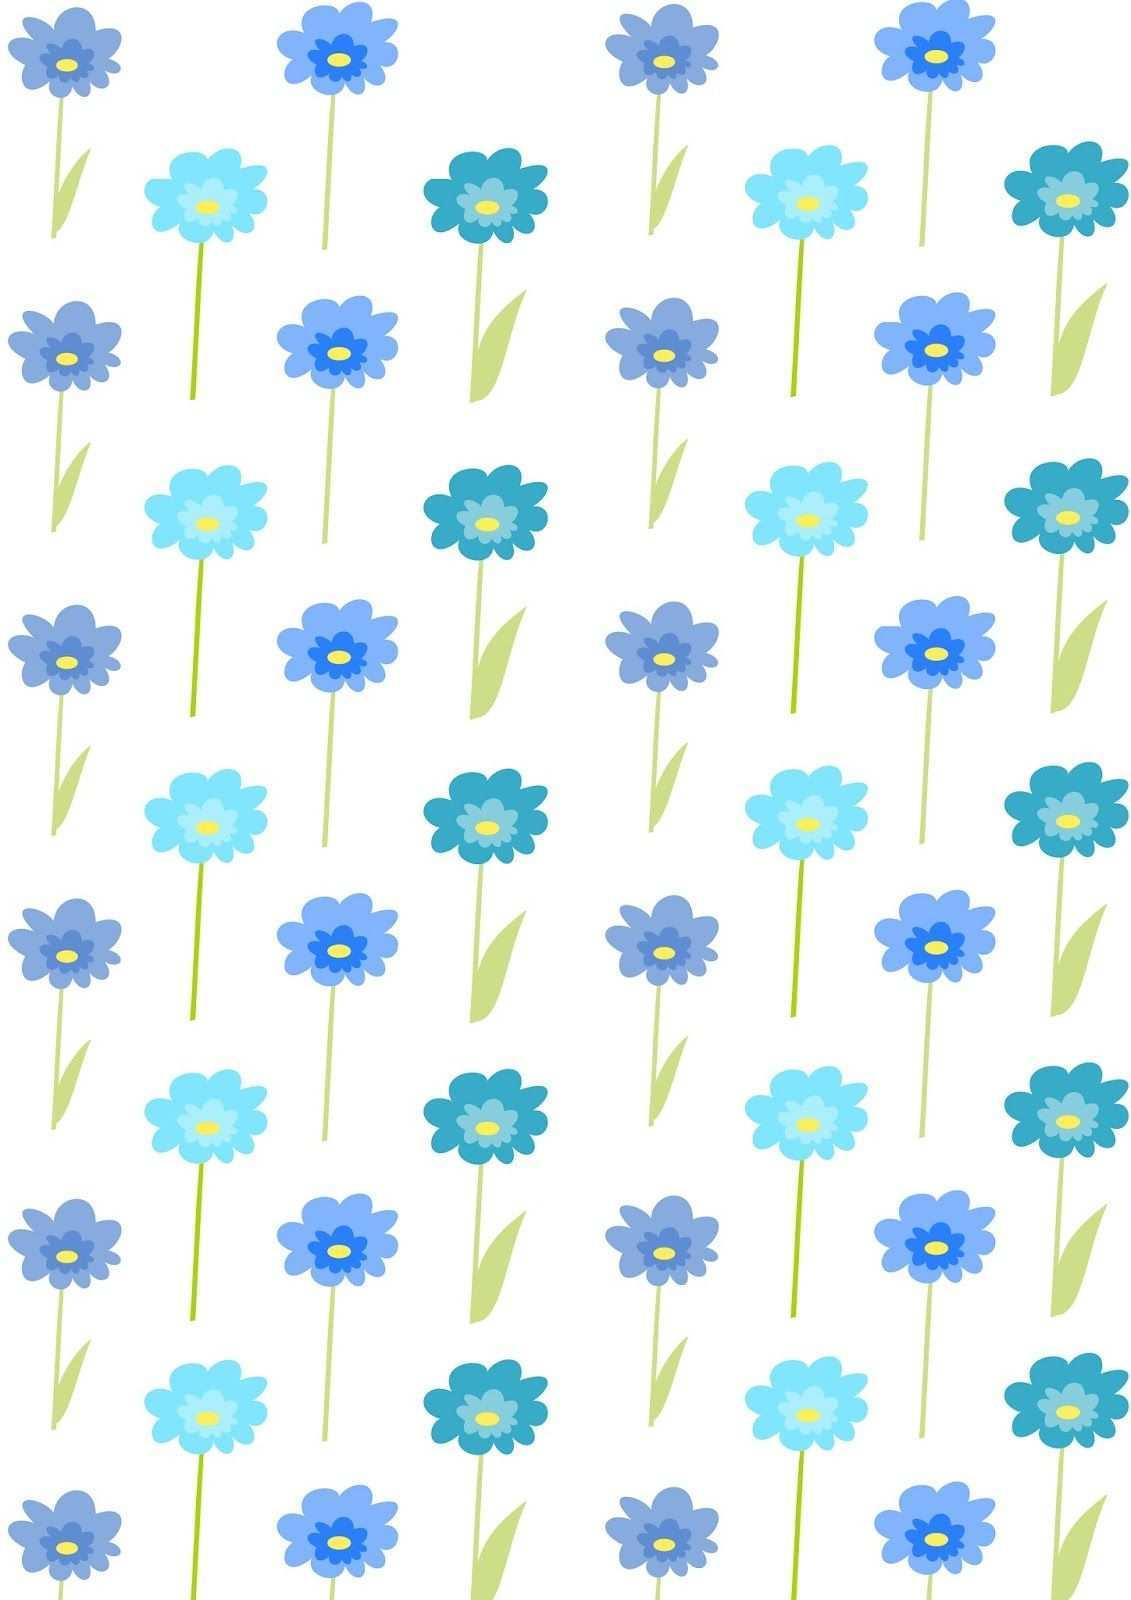 Free Digital Floral Scrapbooking Paper Blue Flowers Ausdruckbares Geschenkpapier Freebie Papier Hintergrund Geschenkpapier Papier Fur Erinnerungsalben